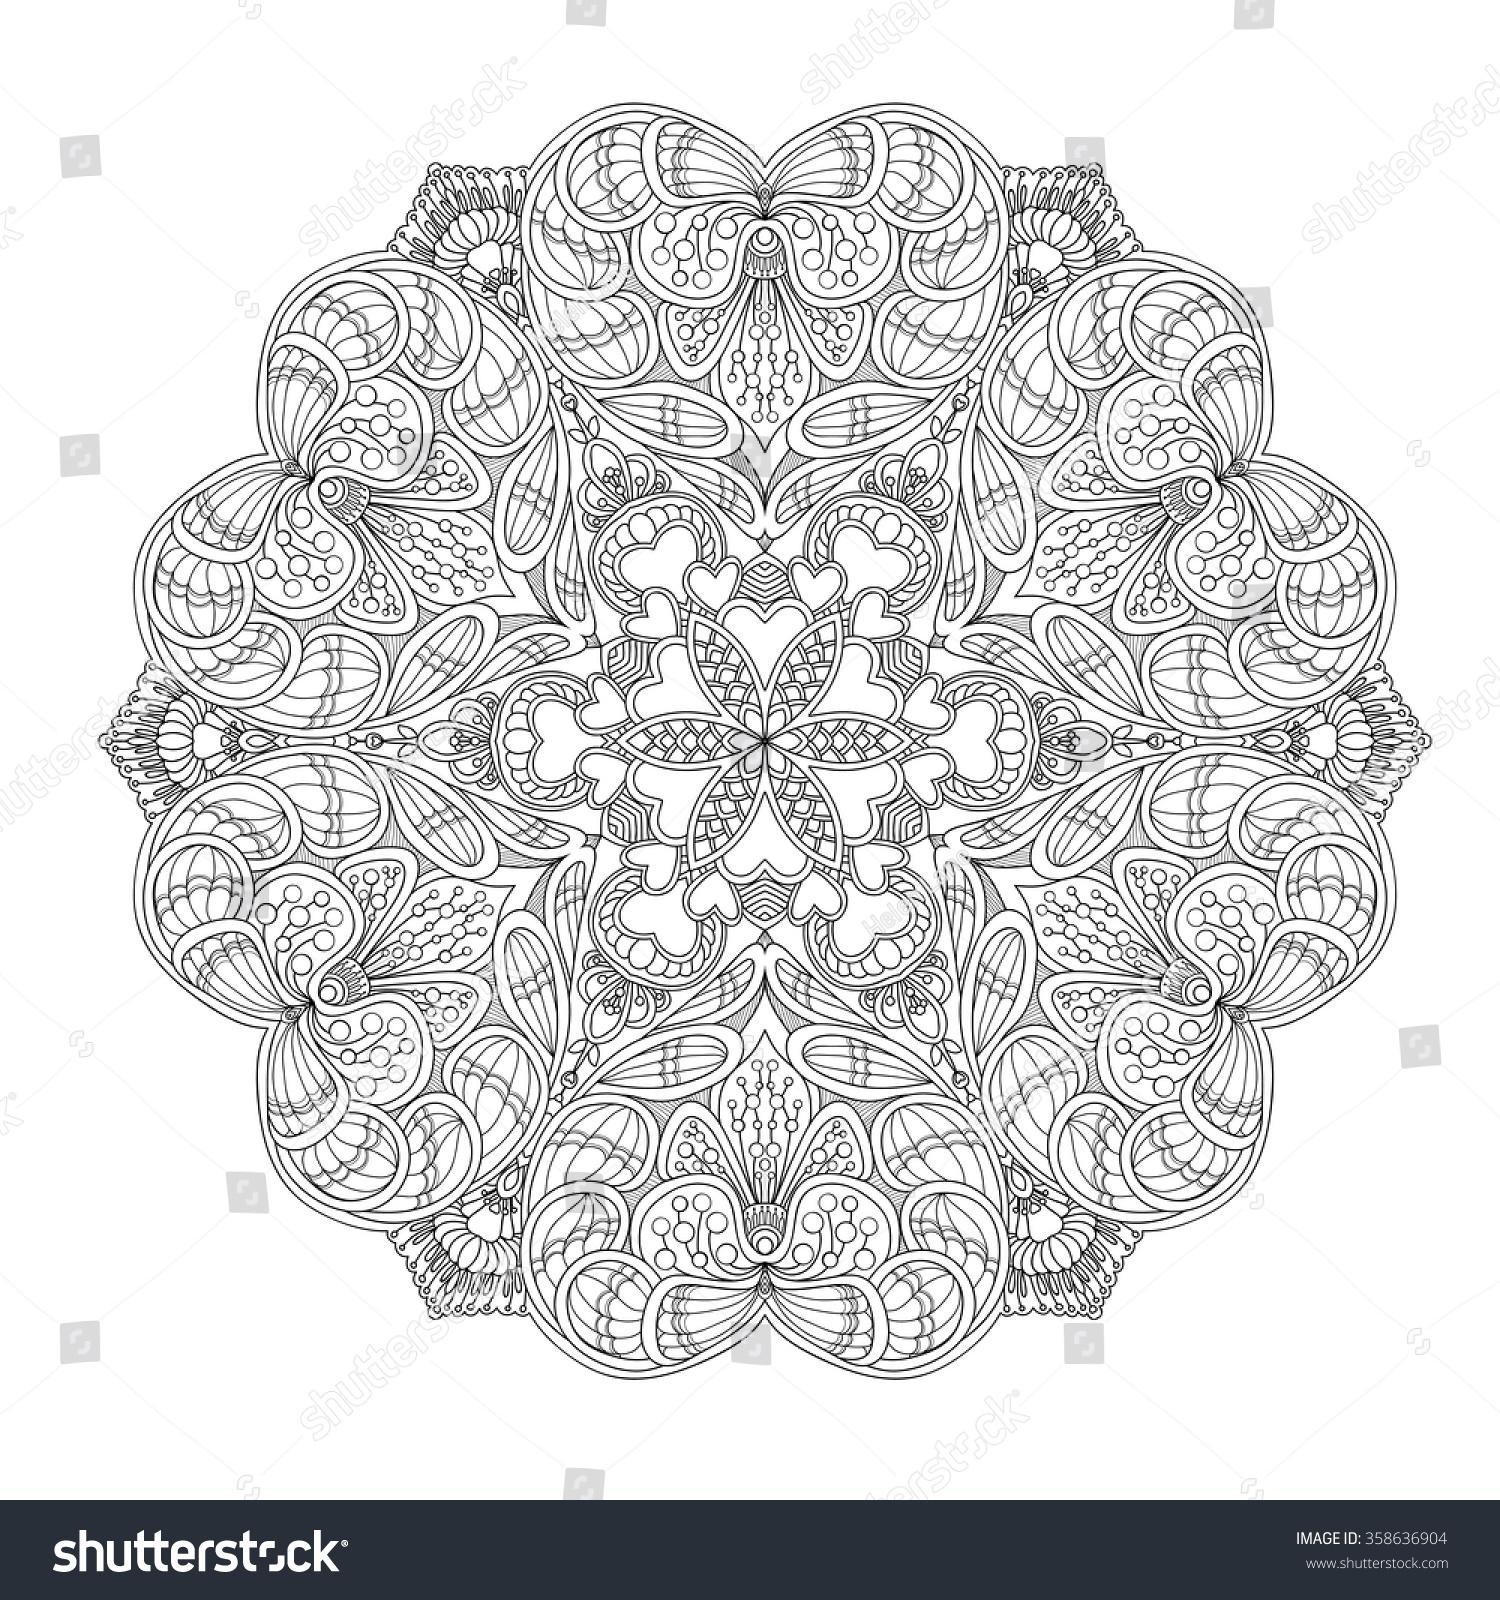 Decorative Mandala Love Hearts Coloring Book Stock Vector (Royalty ...